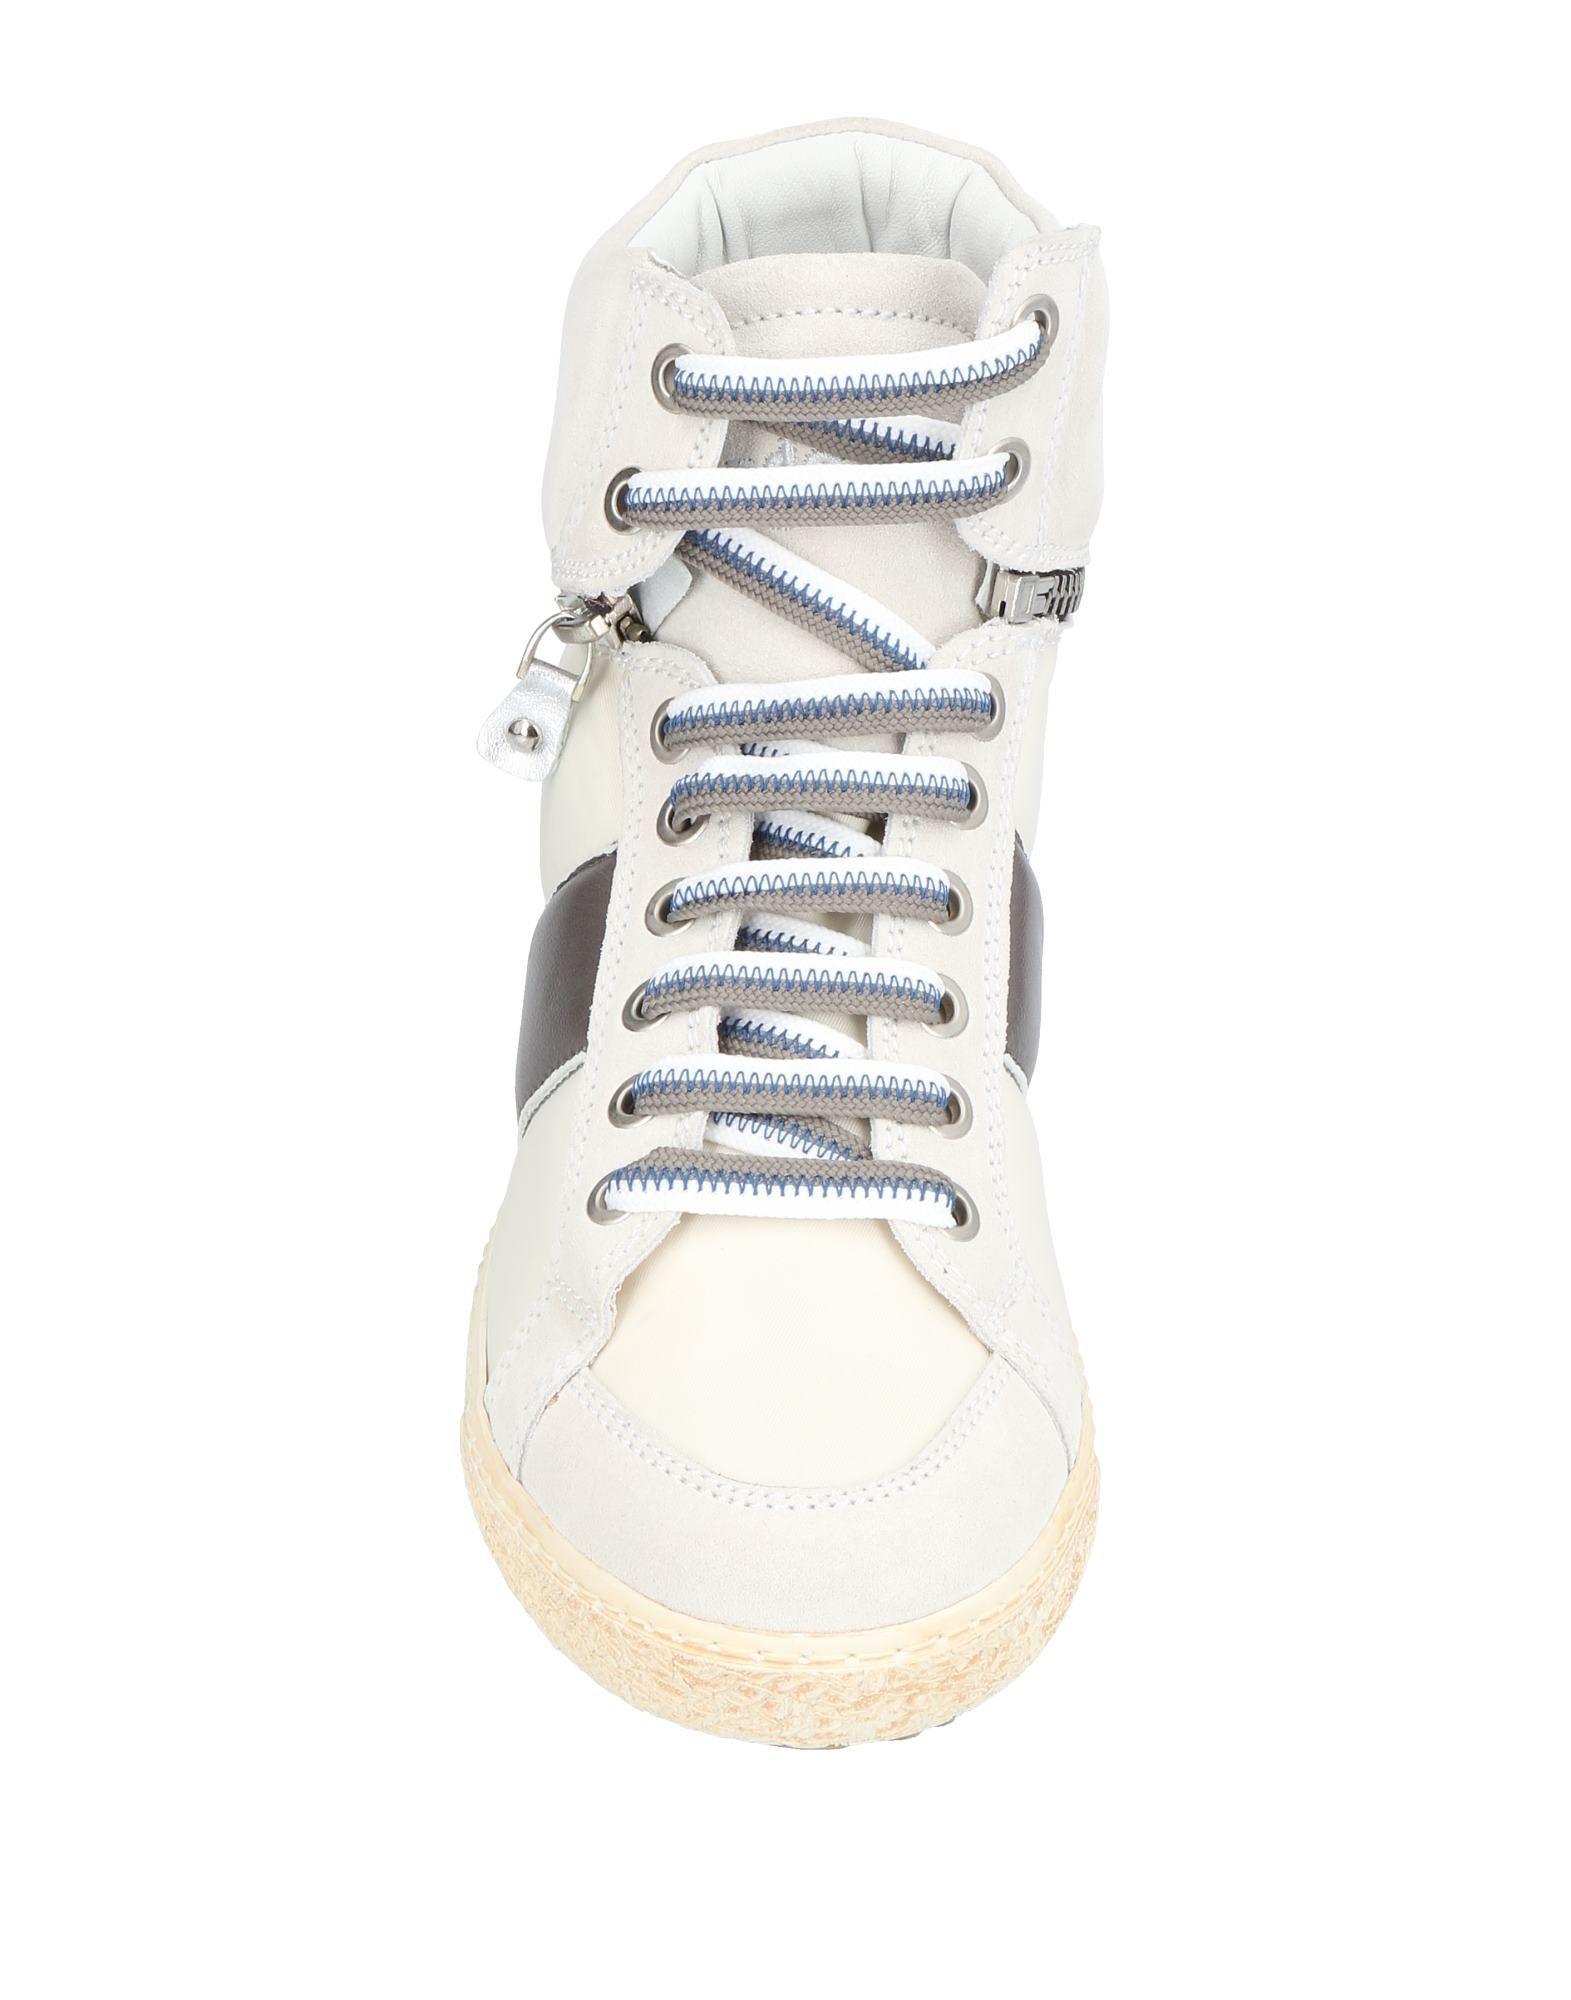 Stilvolle D'oro billige Schuhe Pantofola D'oro Stilvolle Sneakers Damen  11456967KW 52bcee